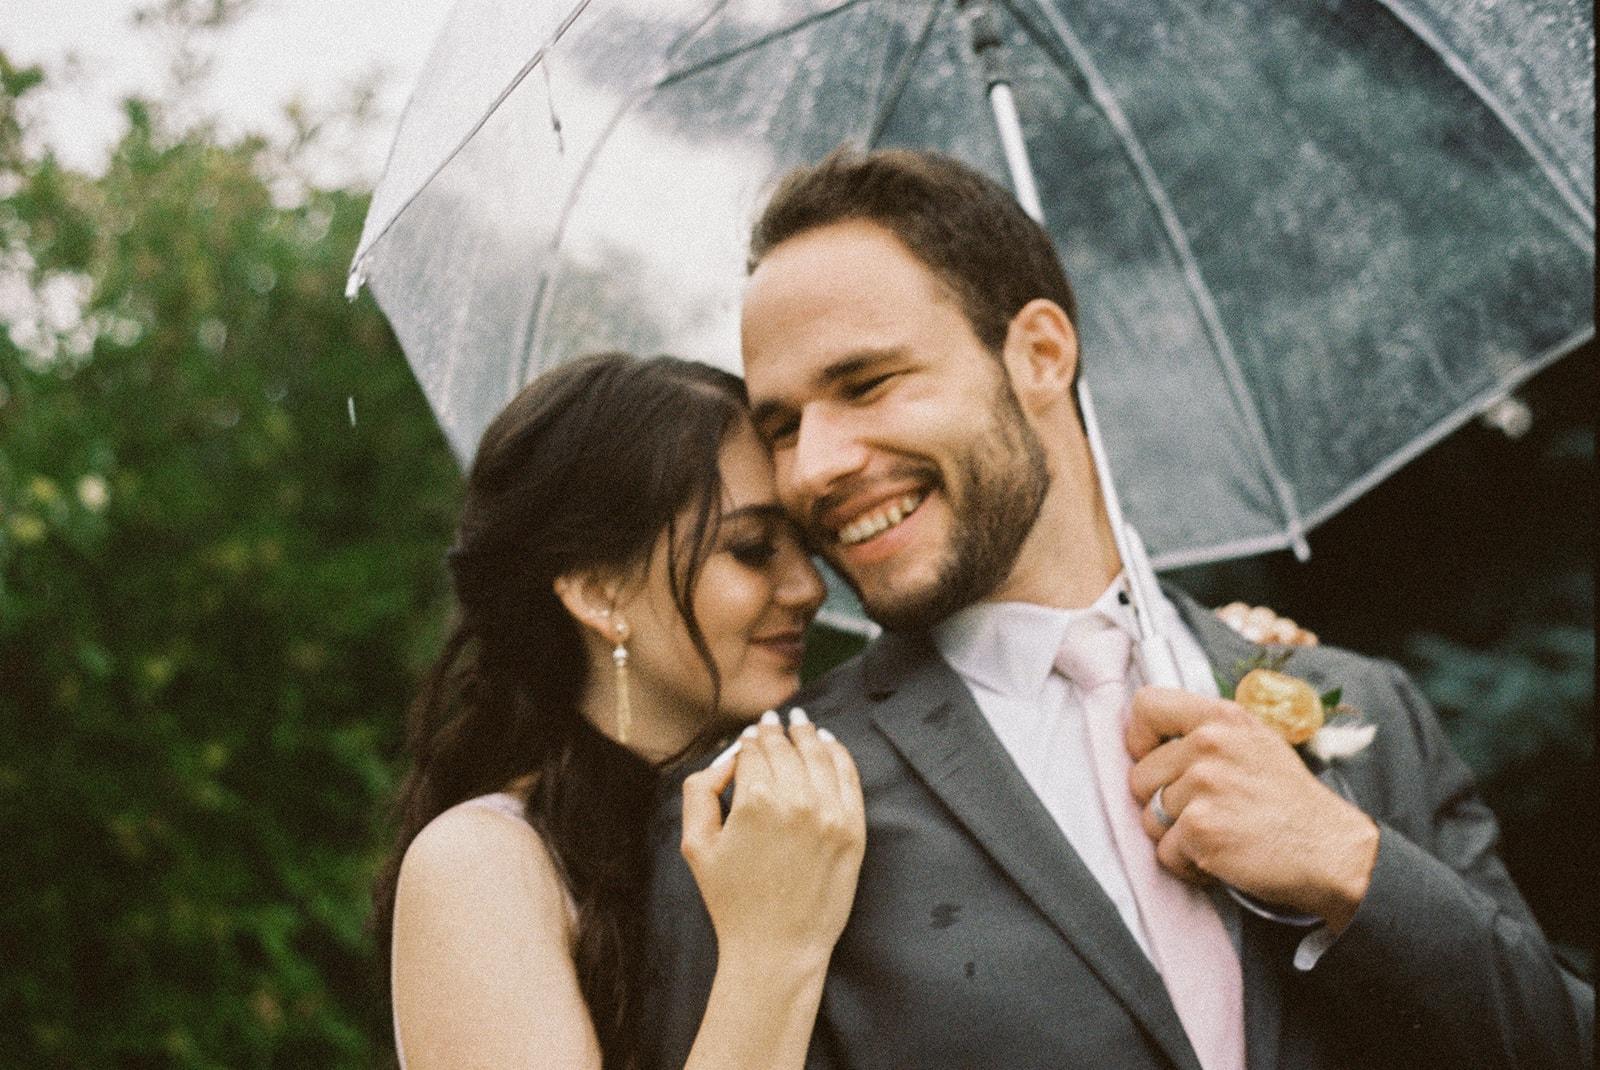 Rainy-Colorado-Wedding-Day